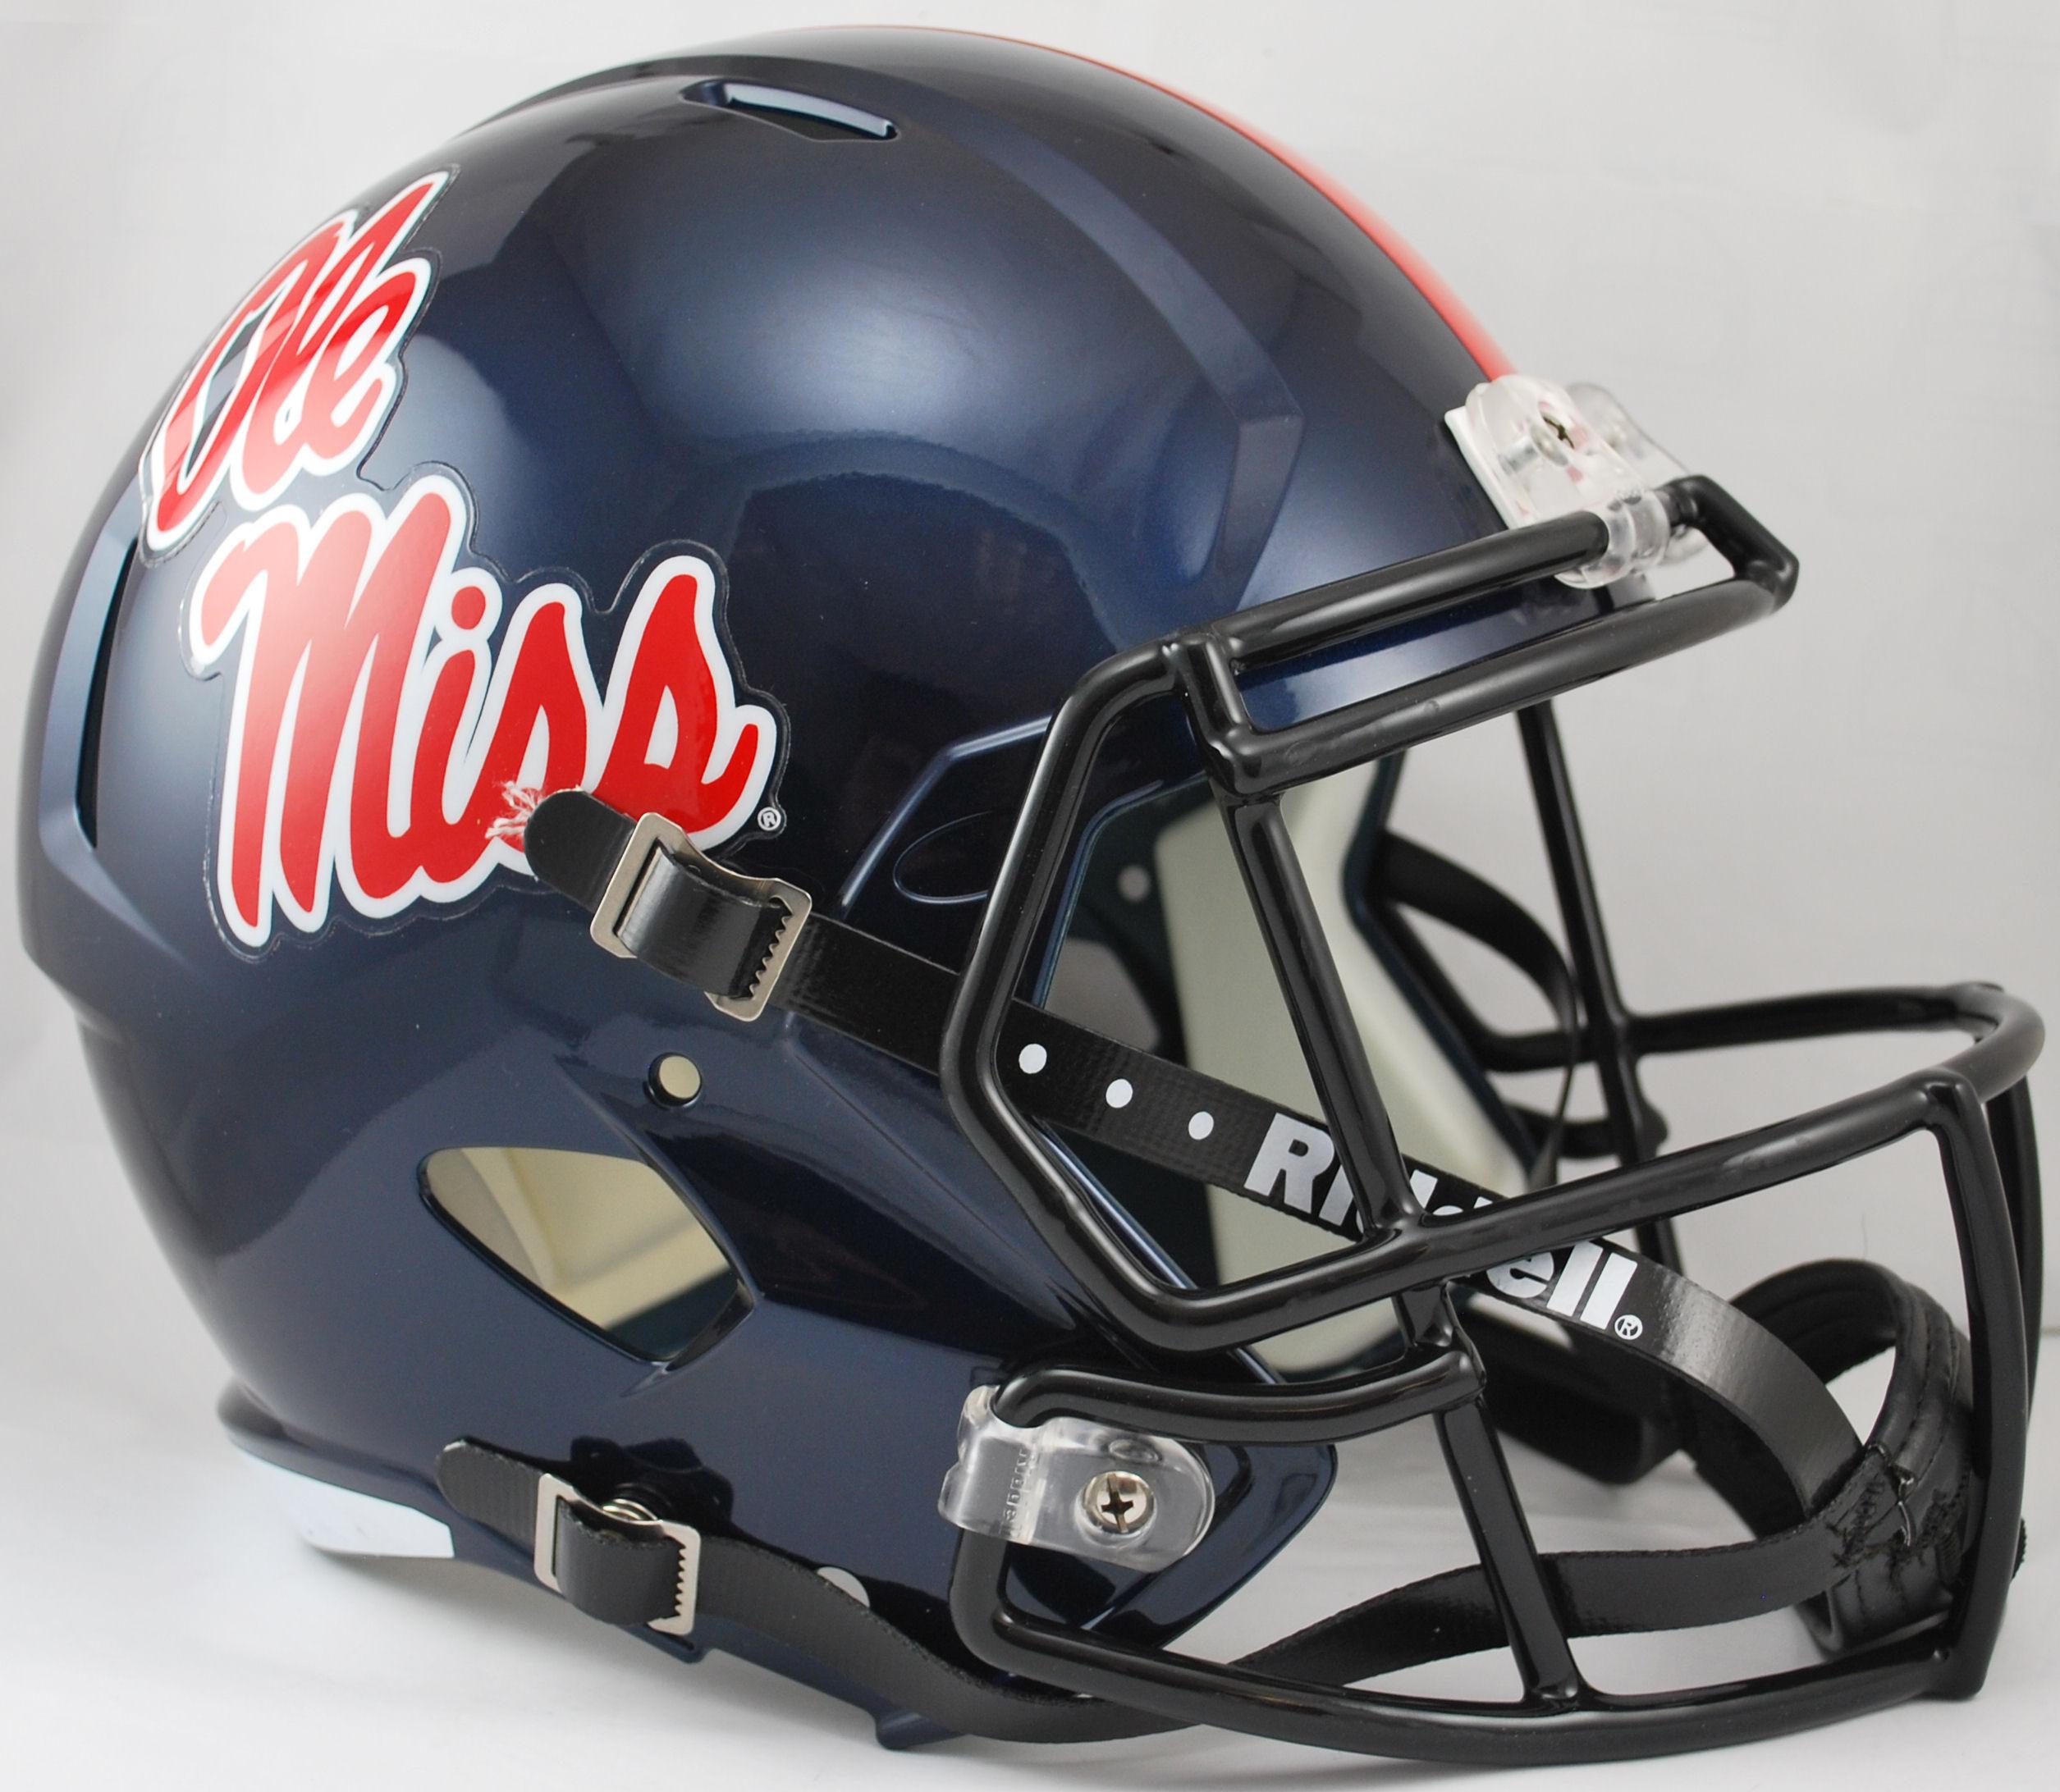 Mississippi (Ole Miss) Rebels Speed Replica Football Helmet